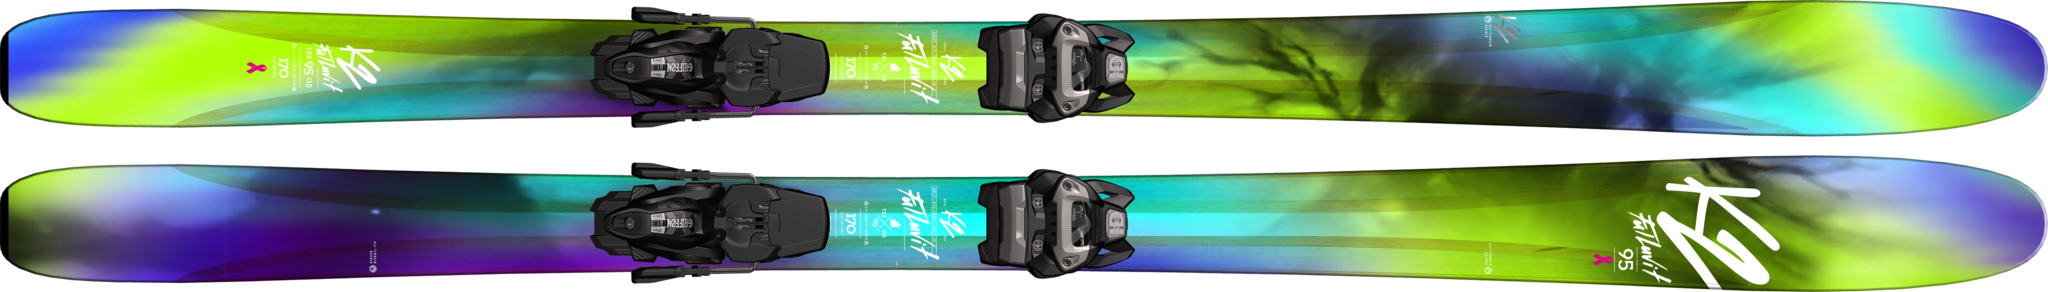 K2 bioflexcore горные лыжи